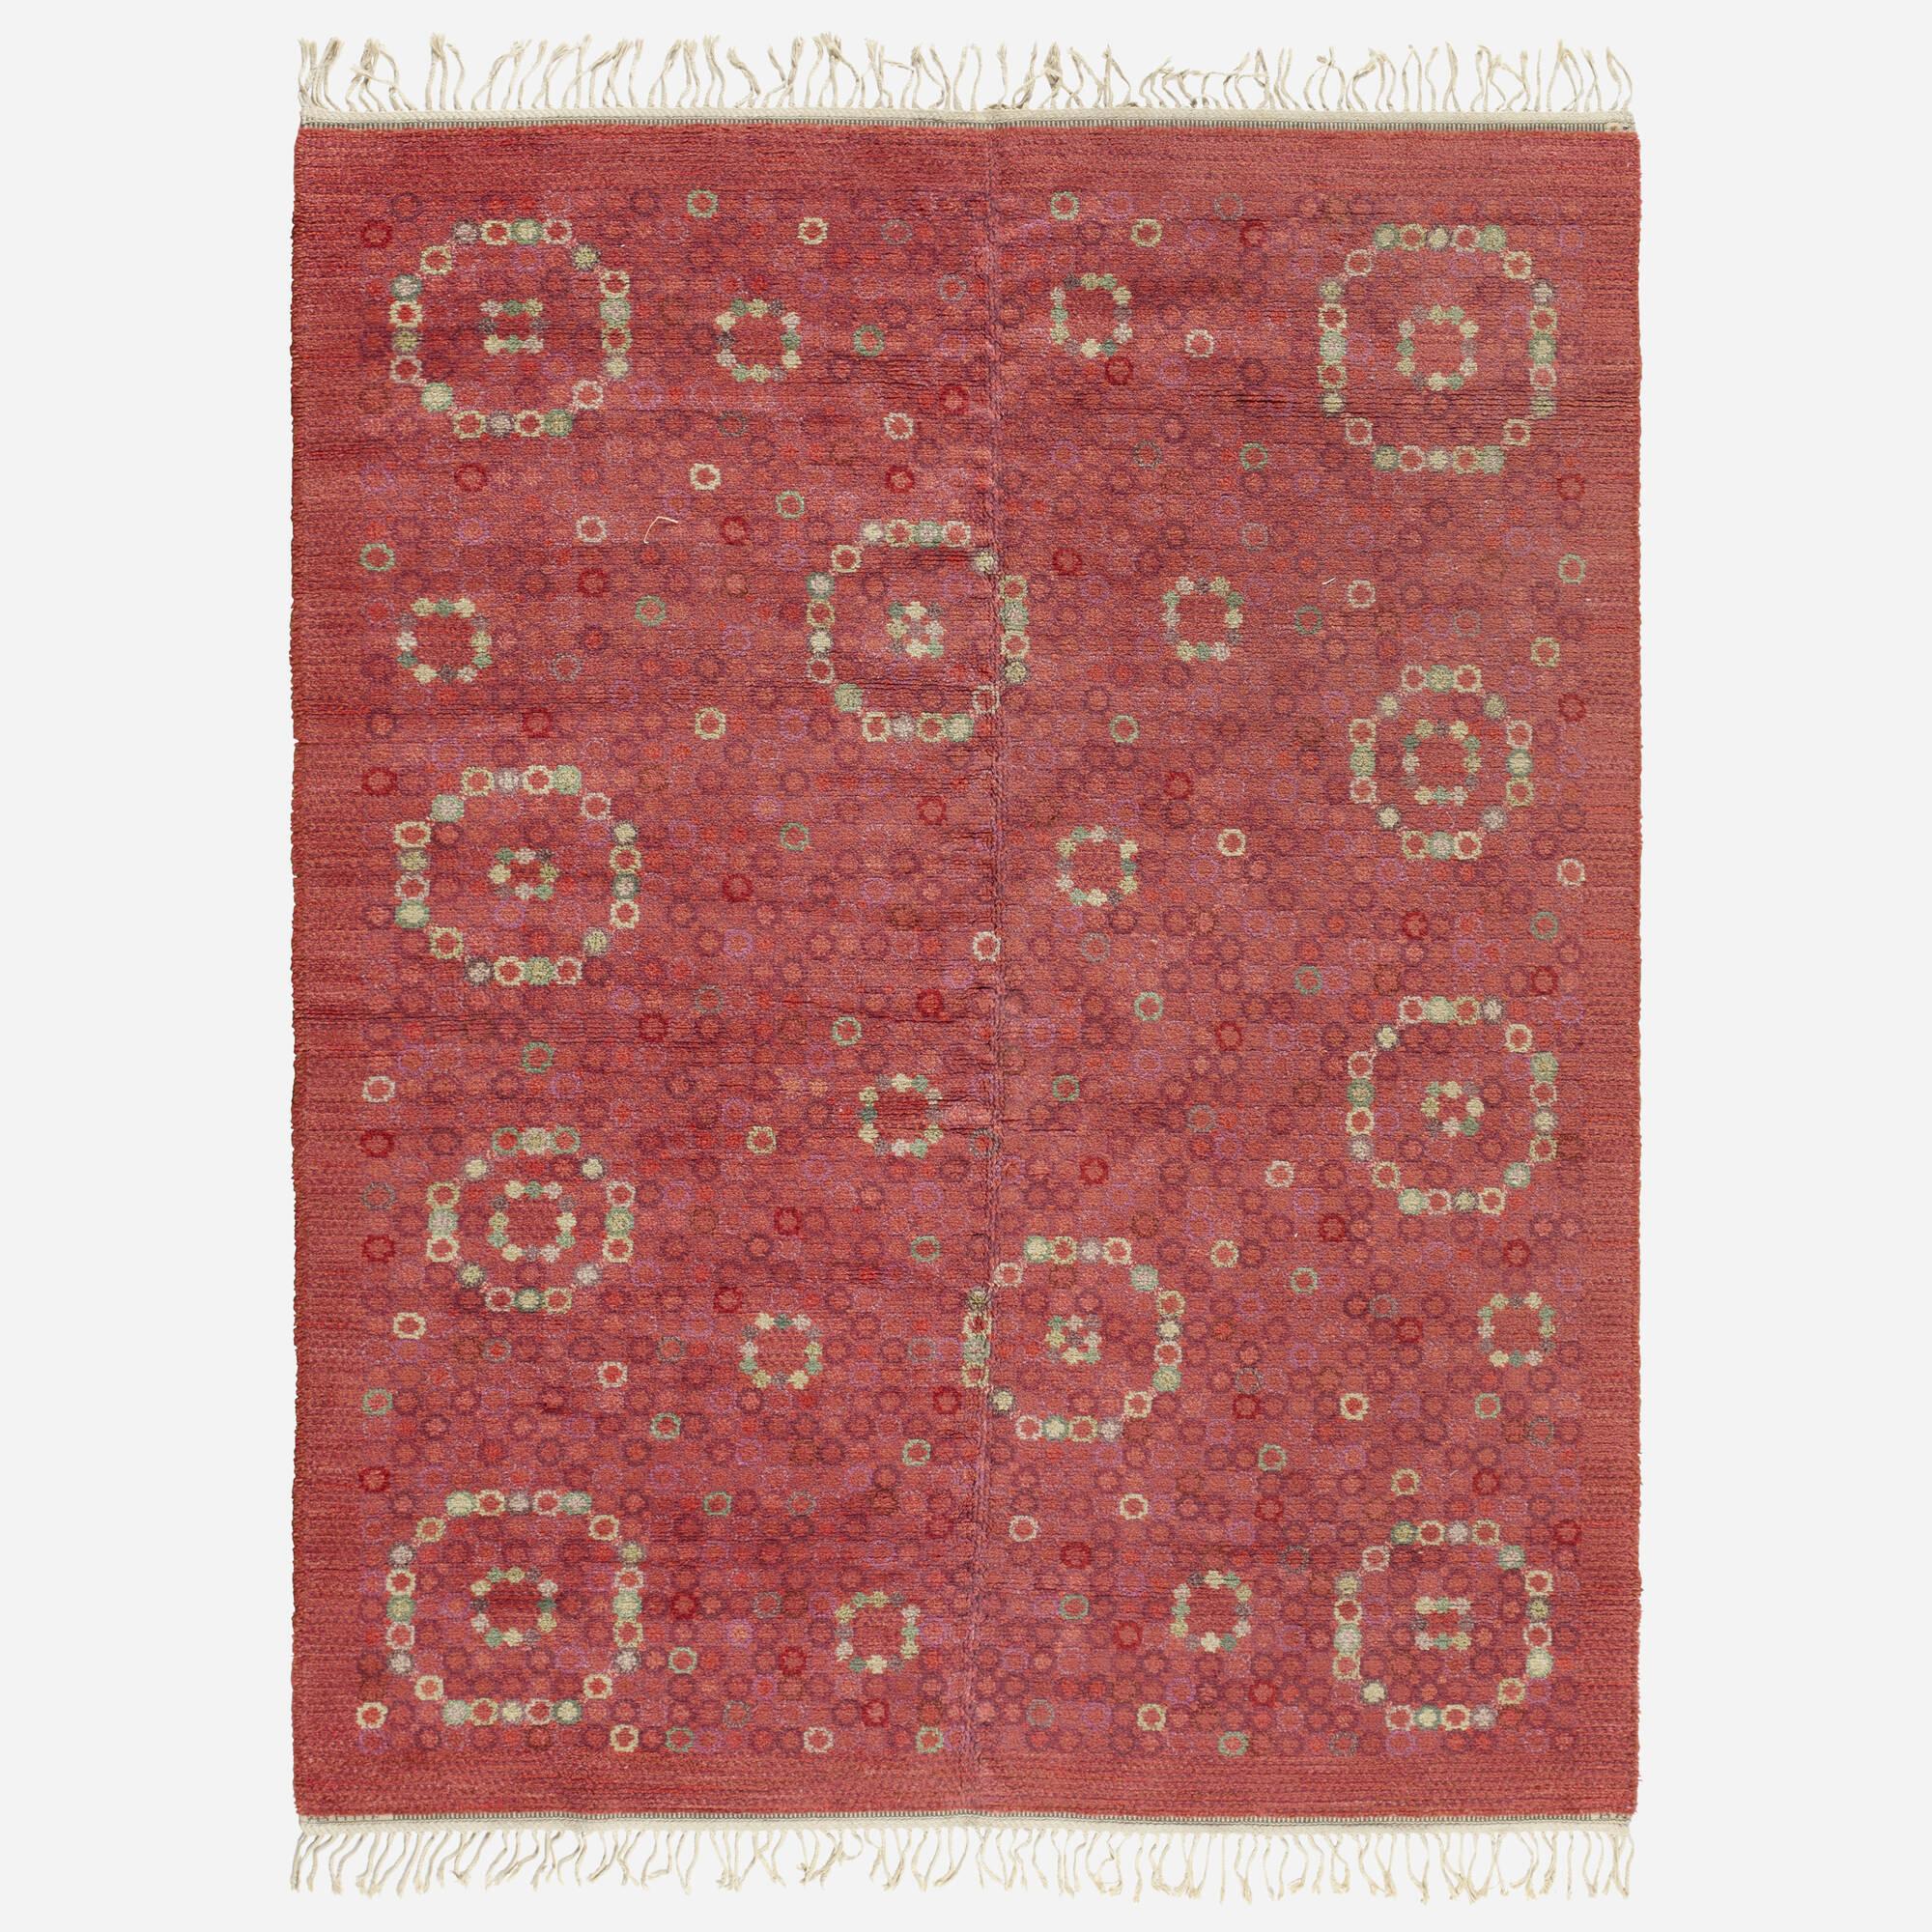 135: Barbro Nilsson / Bankrabbaten pile carpet (1 of 3)